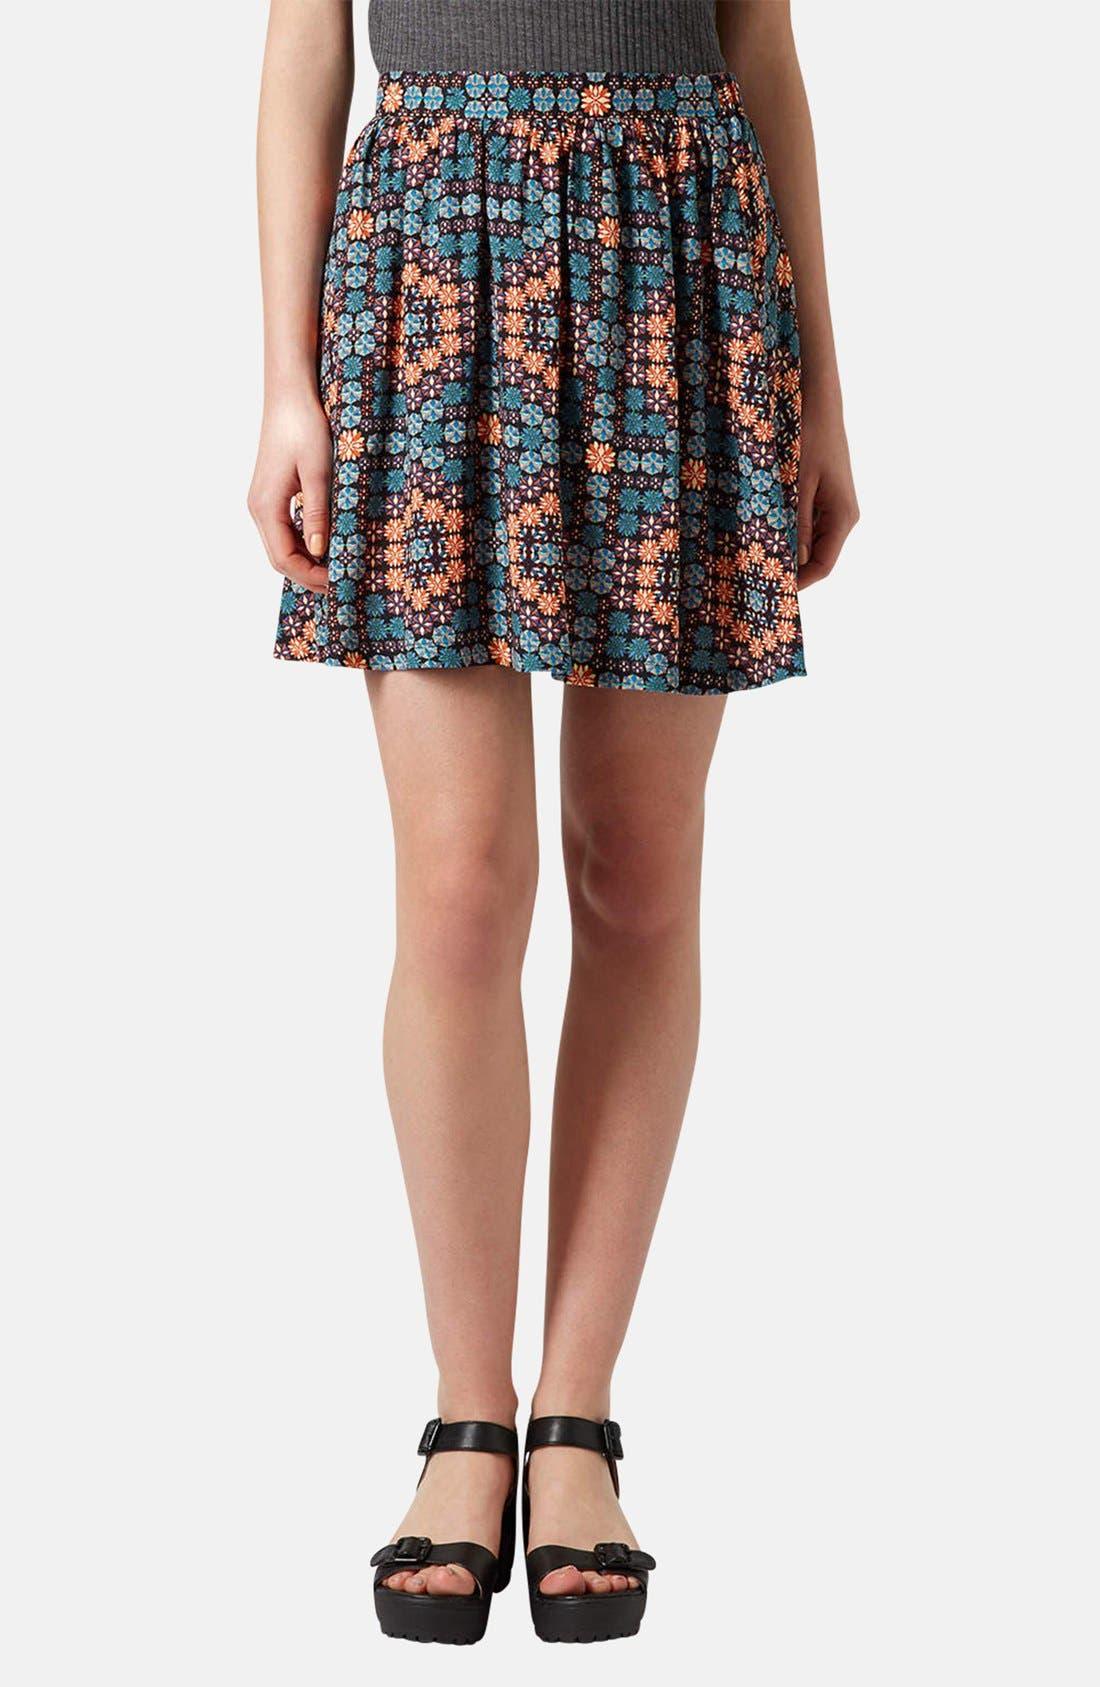 Alternate Image 1 Selected - Topshop 'Milly' Tile Print Skirt